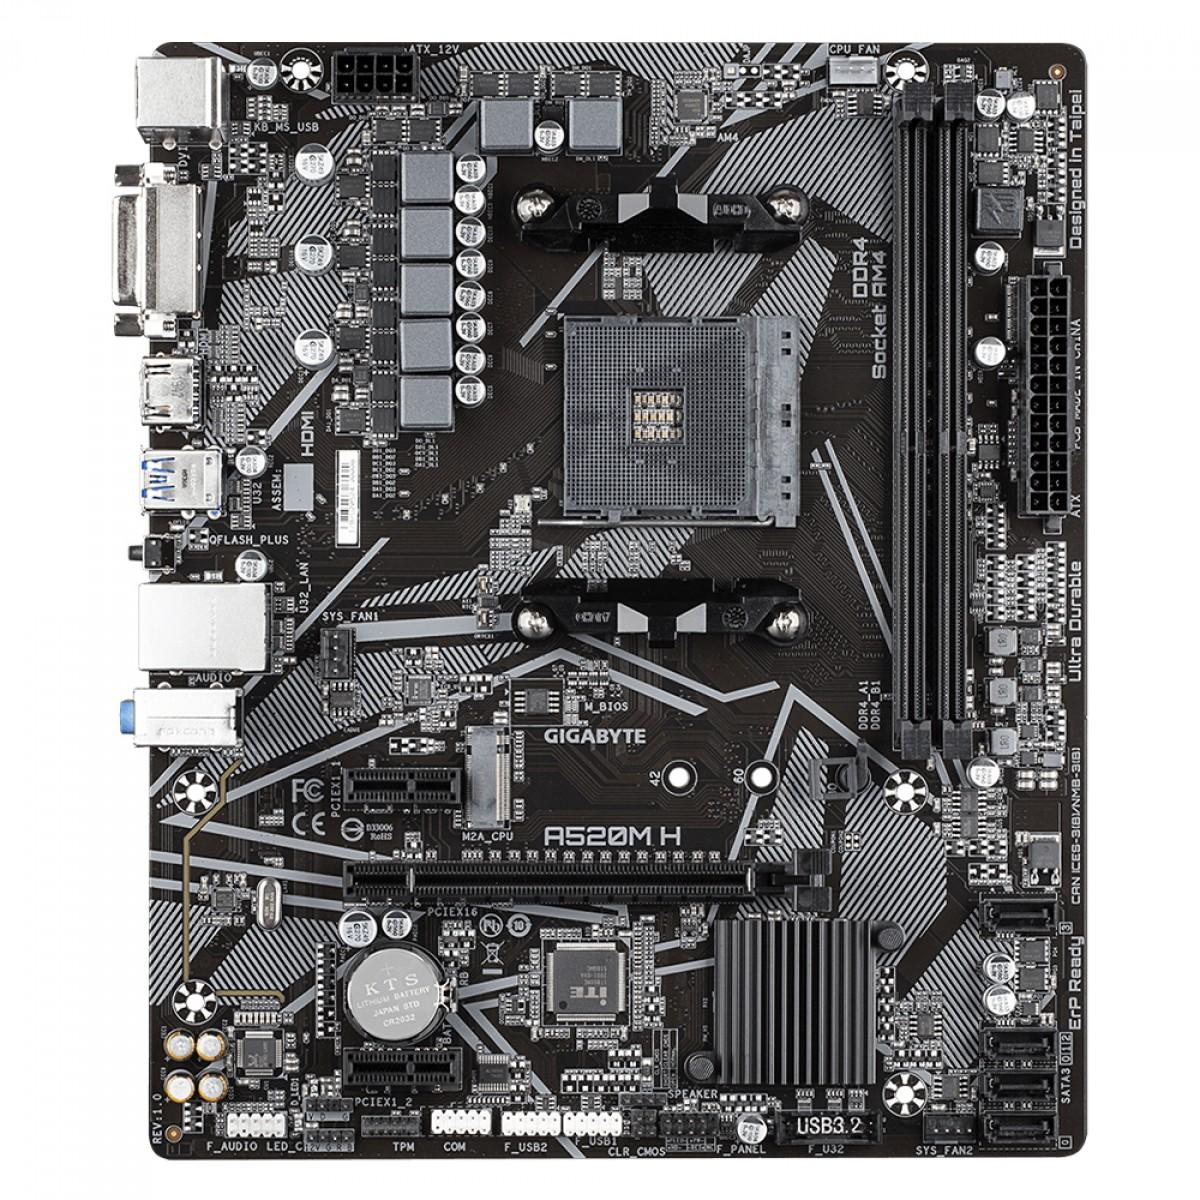 Kit Upgrade, AMD Ryzen 5 PRO 4650G + Gigabyte A520M H